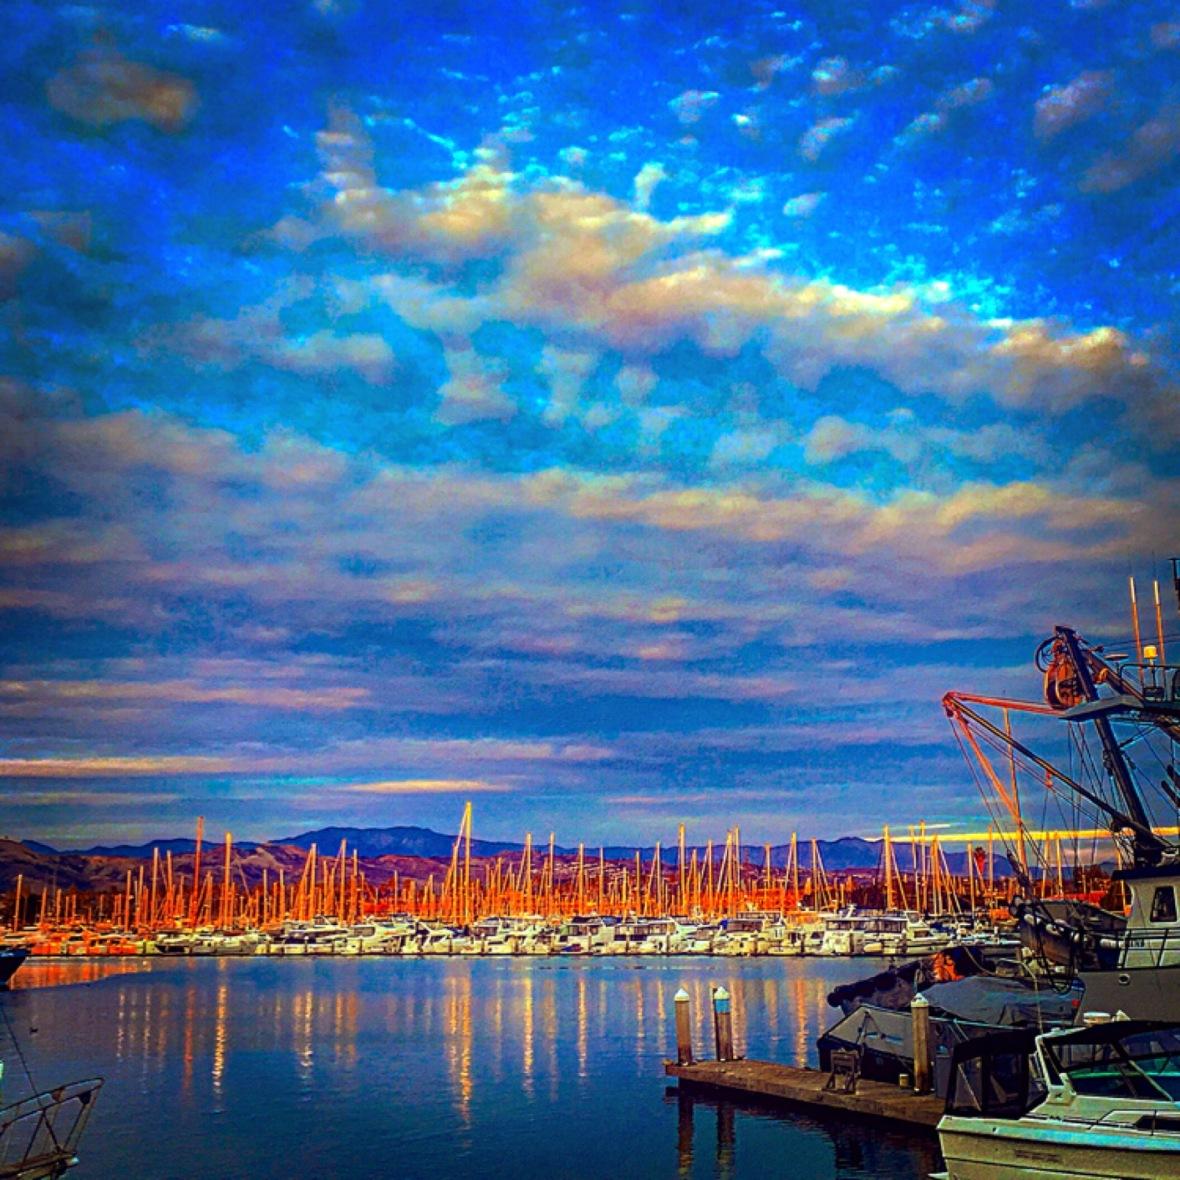 """The Night Awaits"" (Ventura Harbor, CA)"